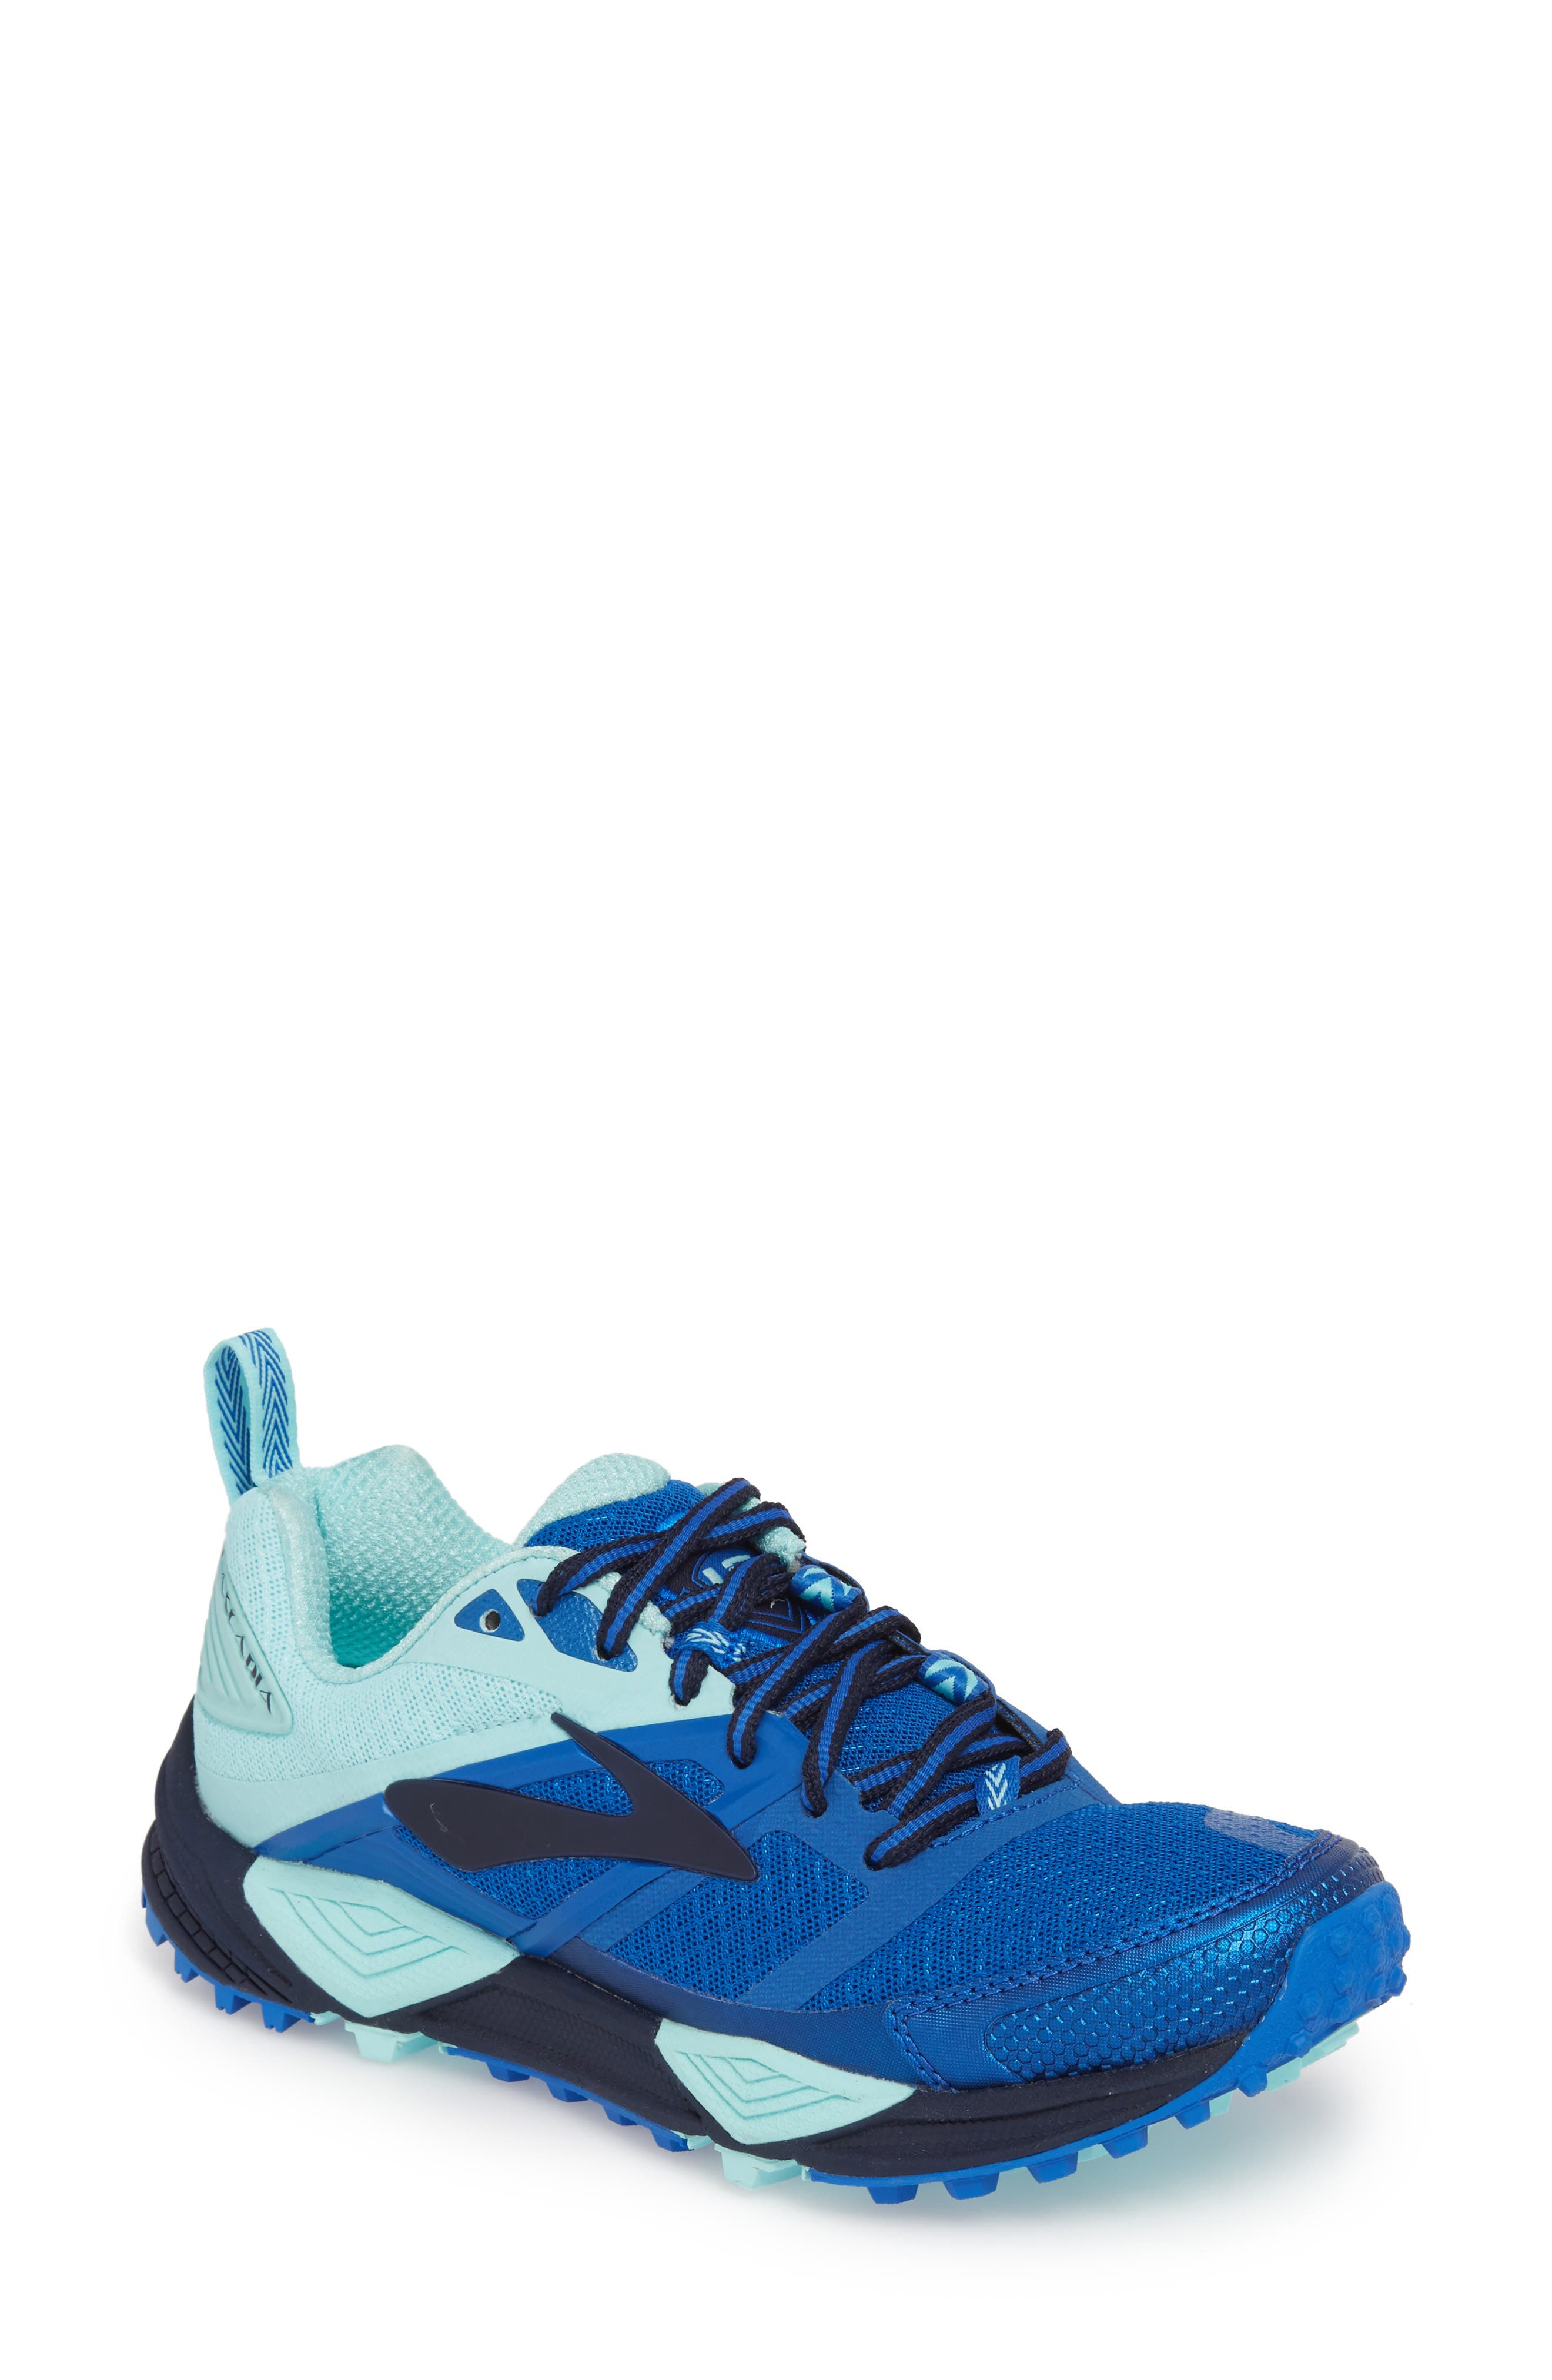 Main Image - Brooks Cascadia 12 Trail Running Shoe (Women)